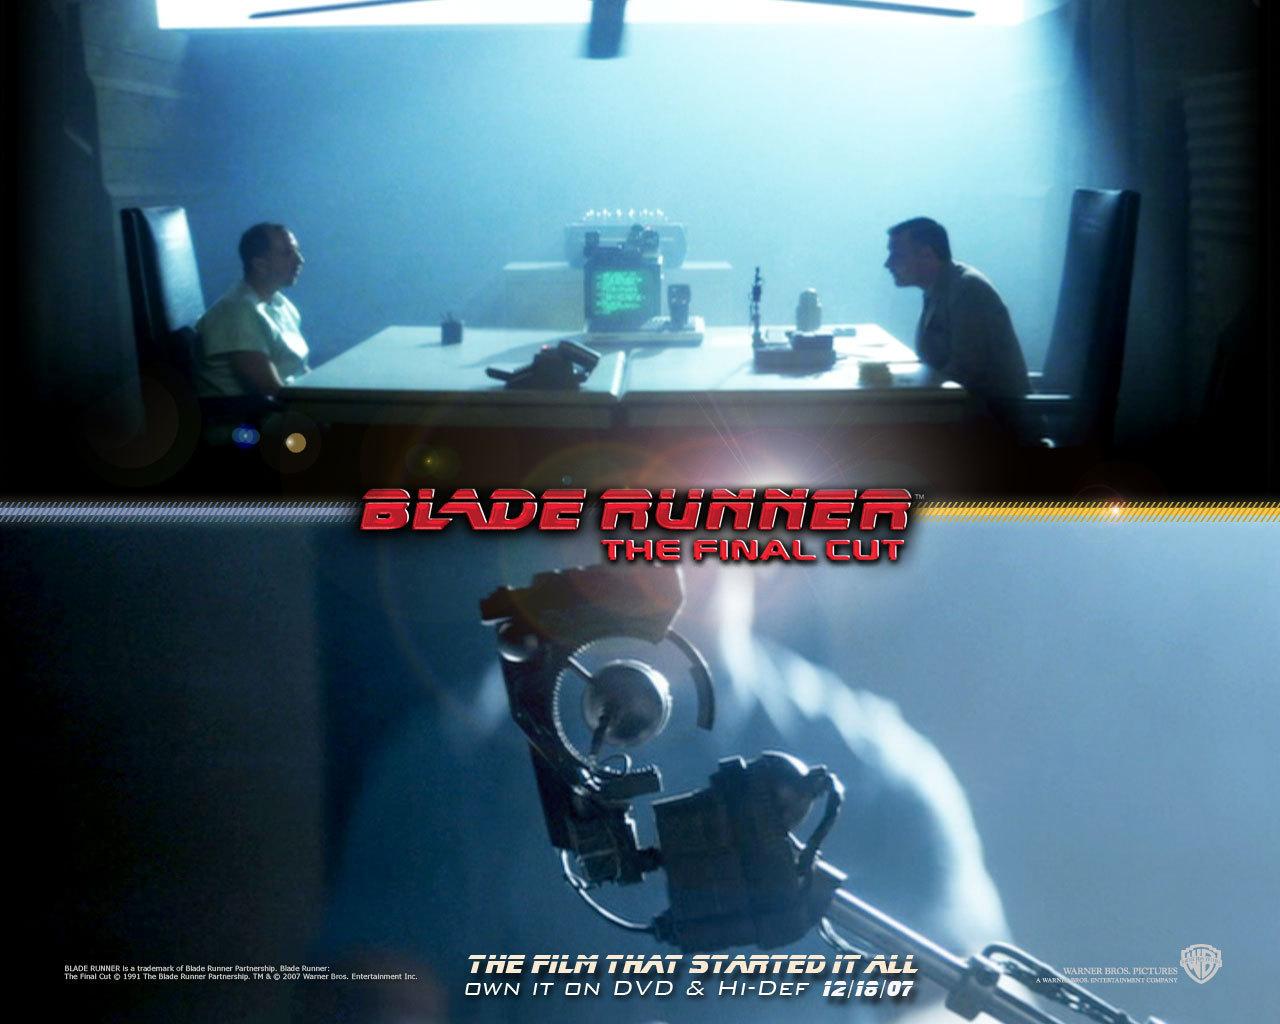 Official Blade Runner Wallpaper Blade Runner Wallpaper 8207471